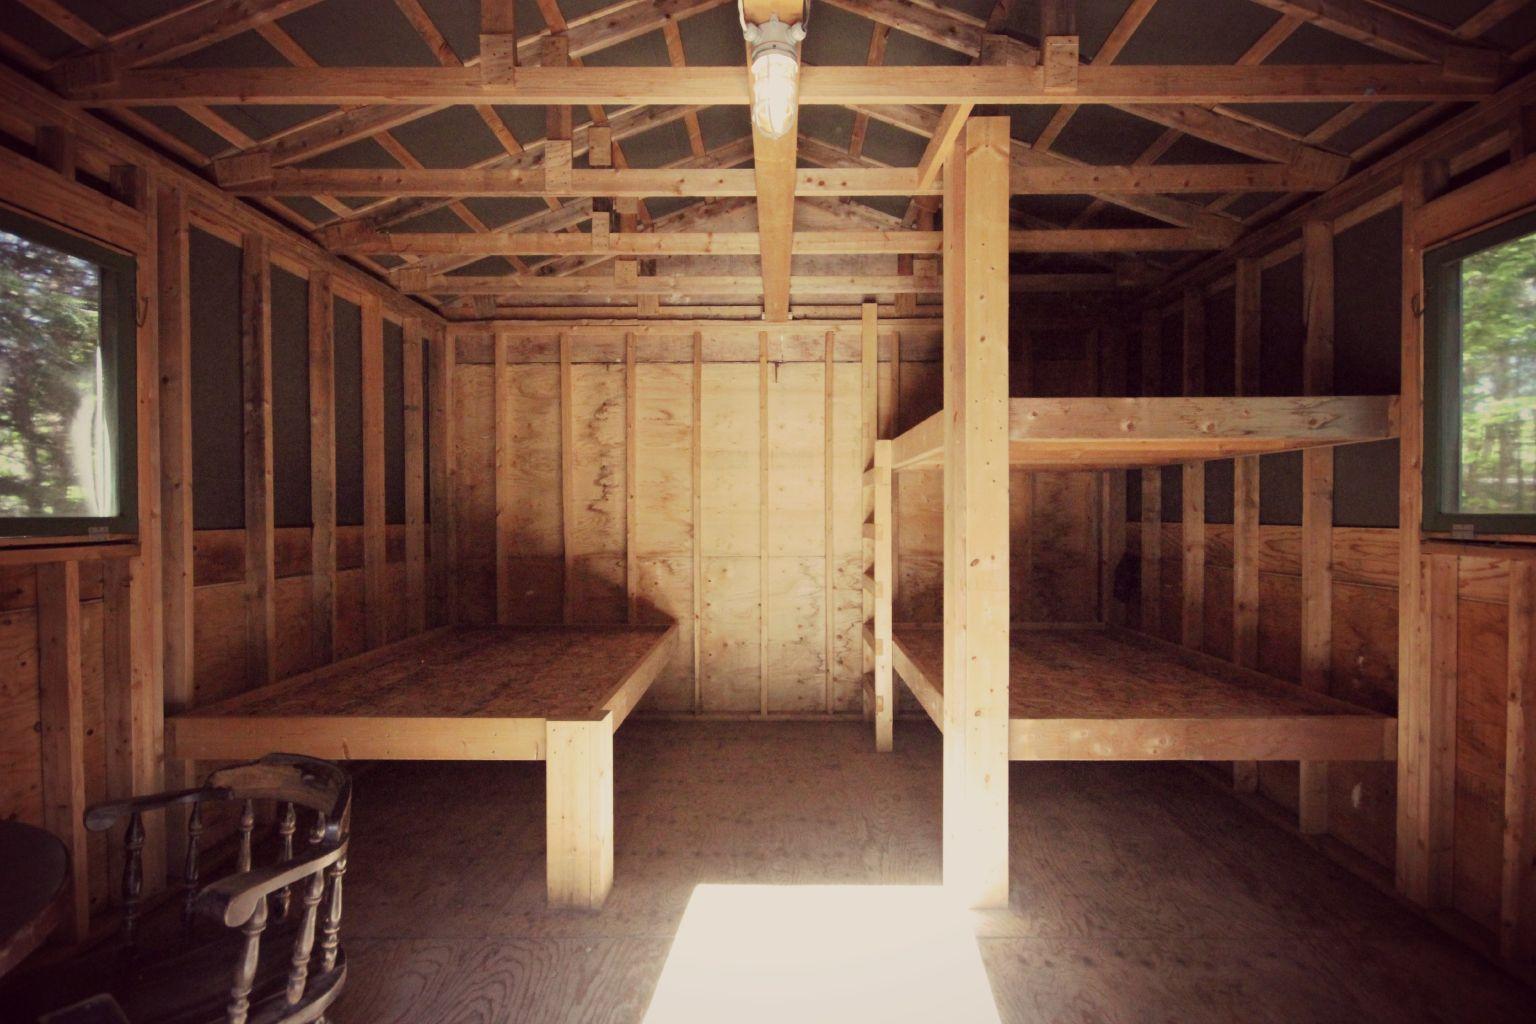 Rustic Shelter Camping At Mactaquac Park Fredericton Nb